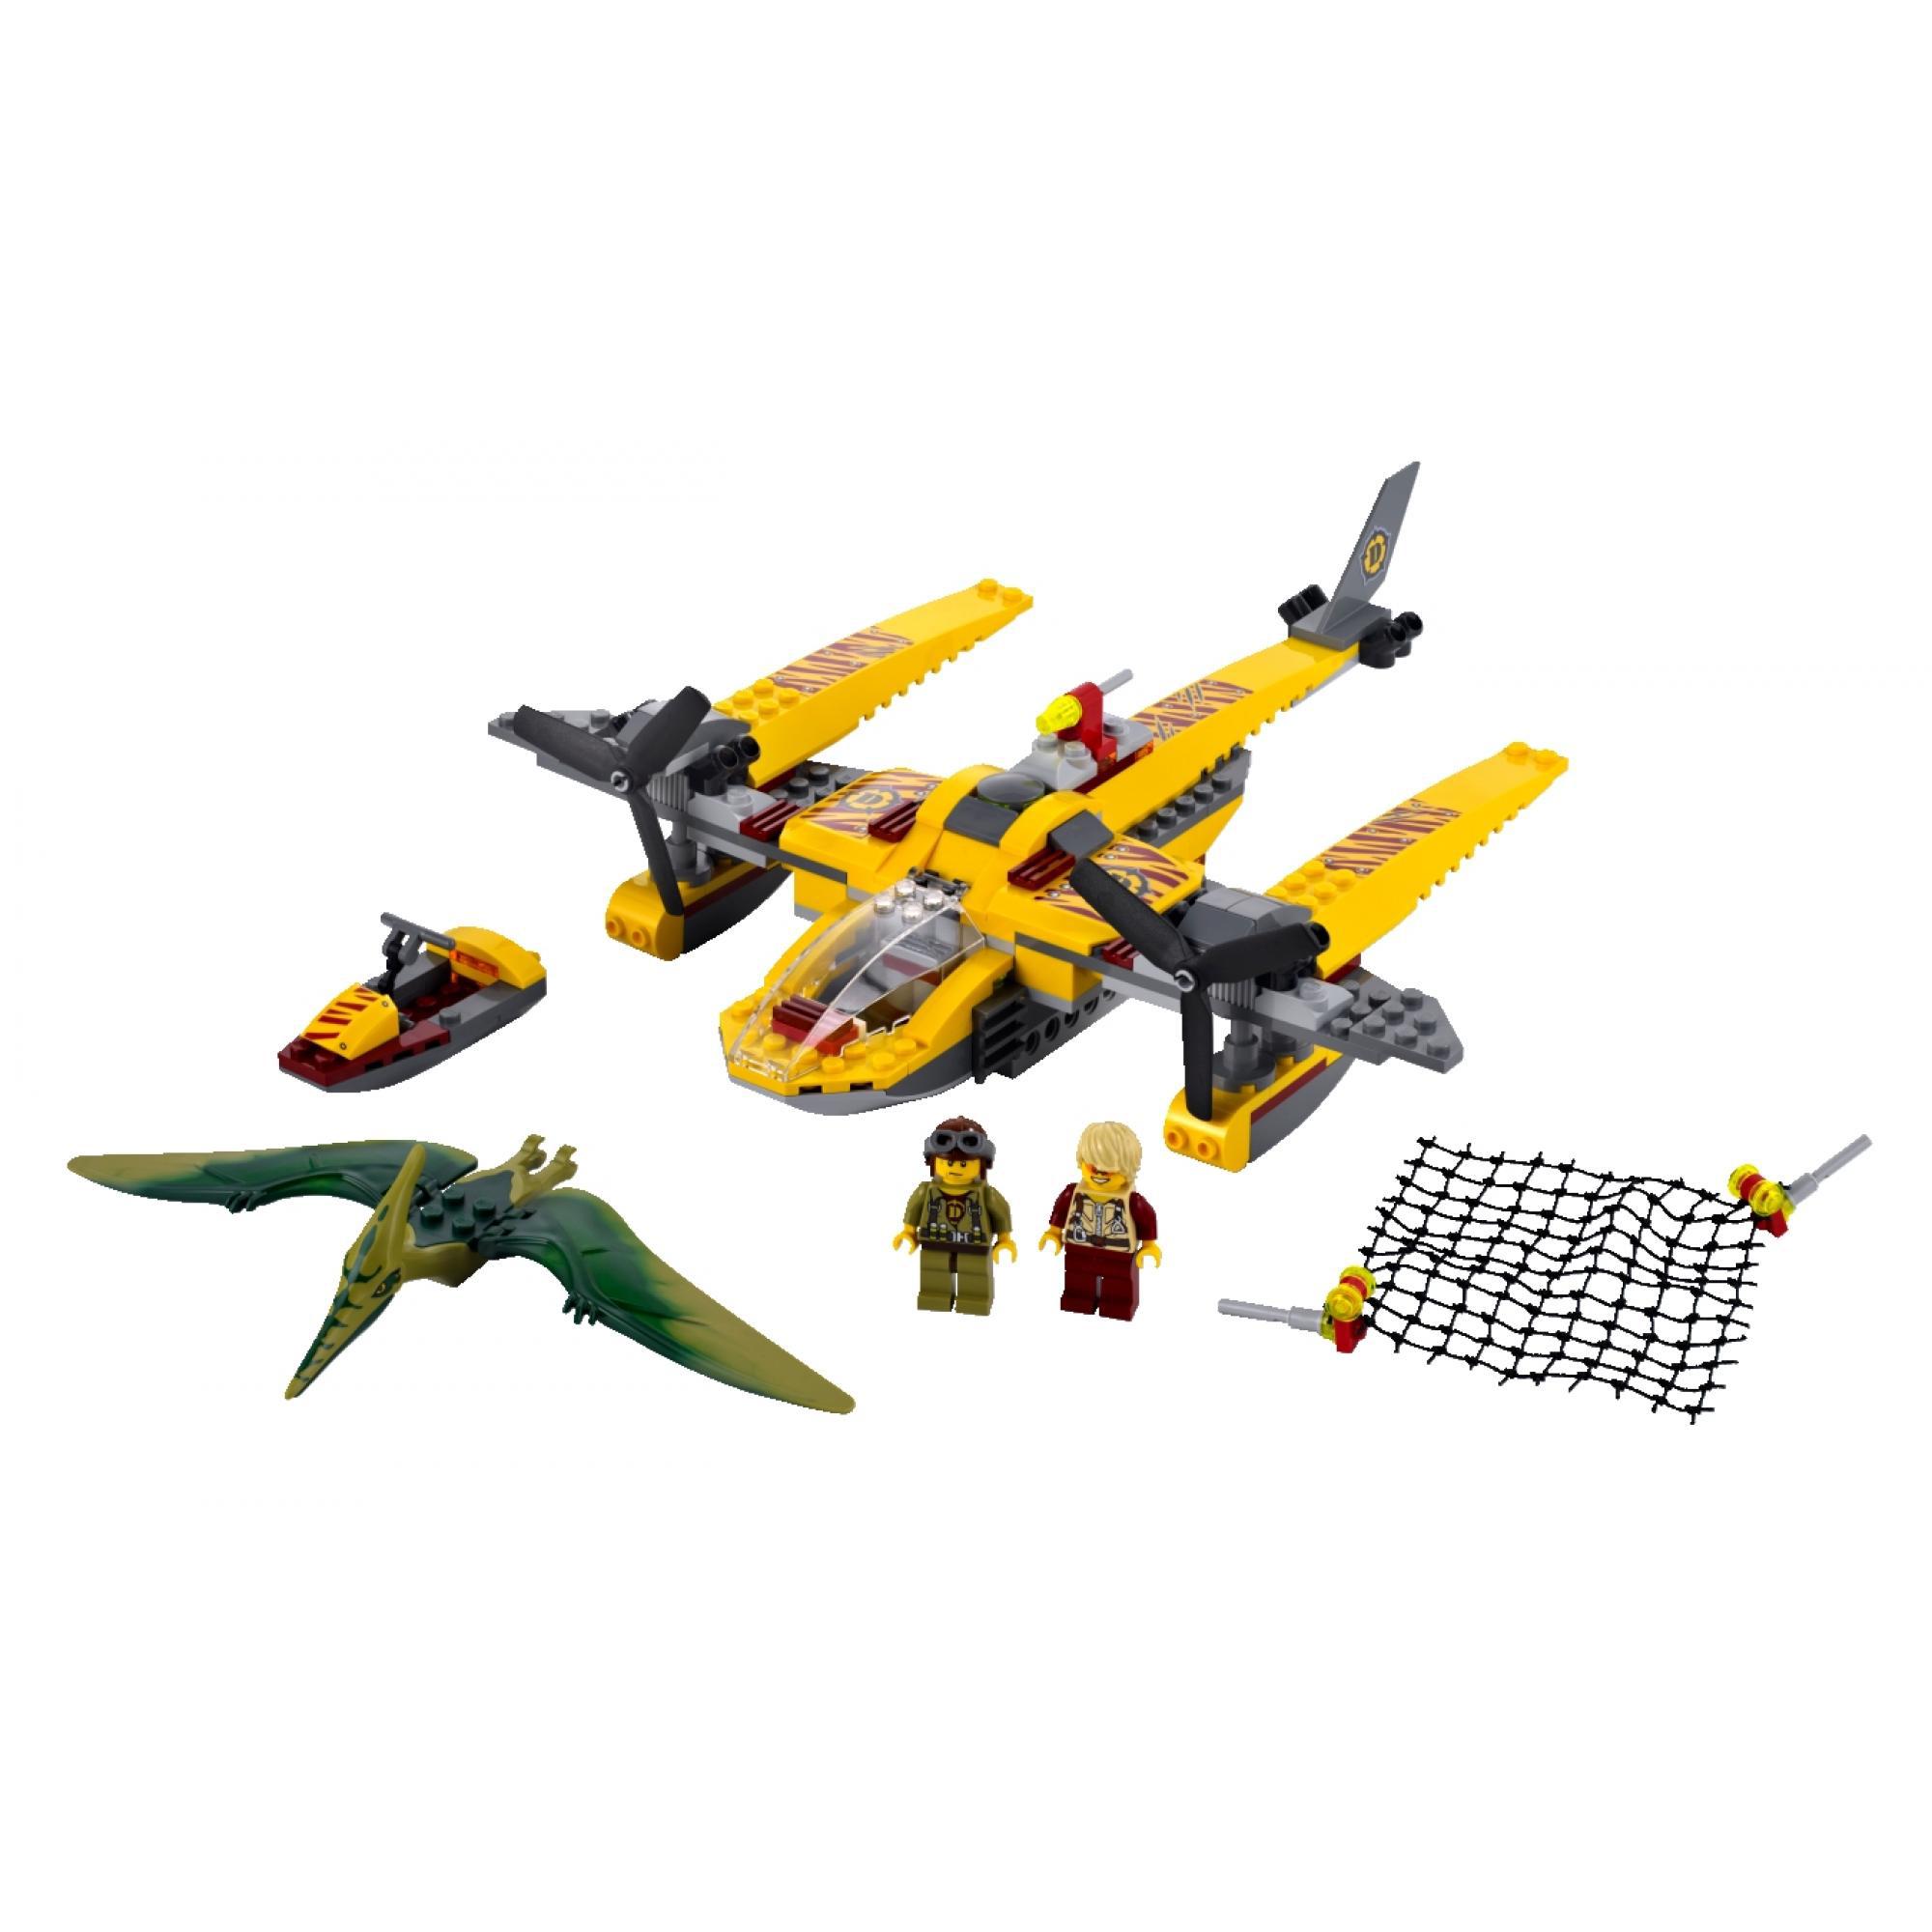 Lego forums toys n bricks - Lego dinosaures ...